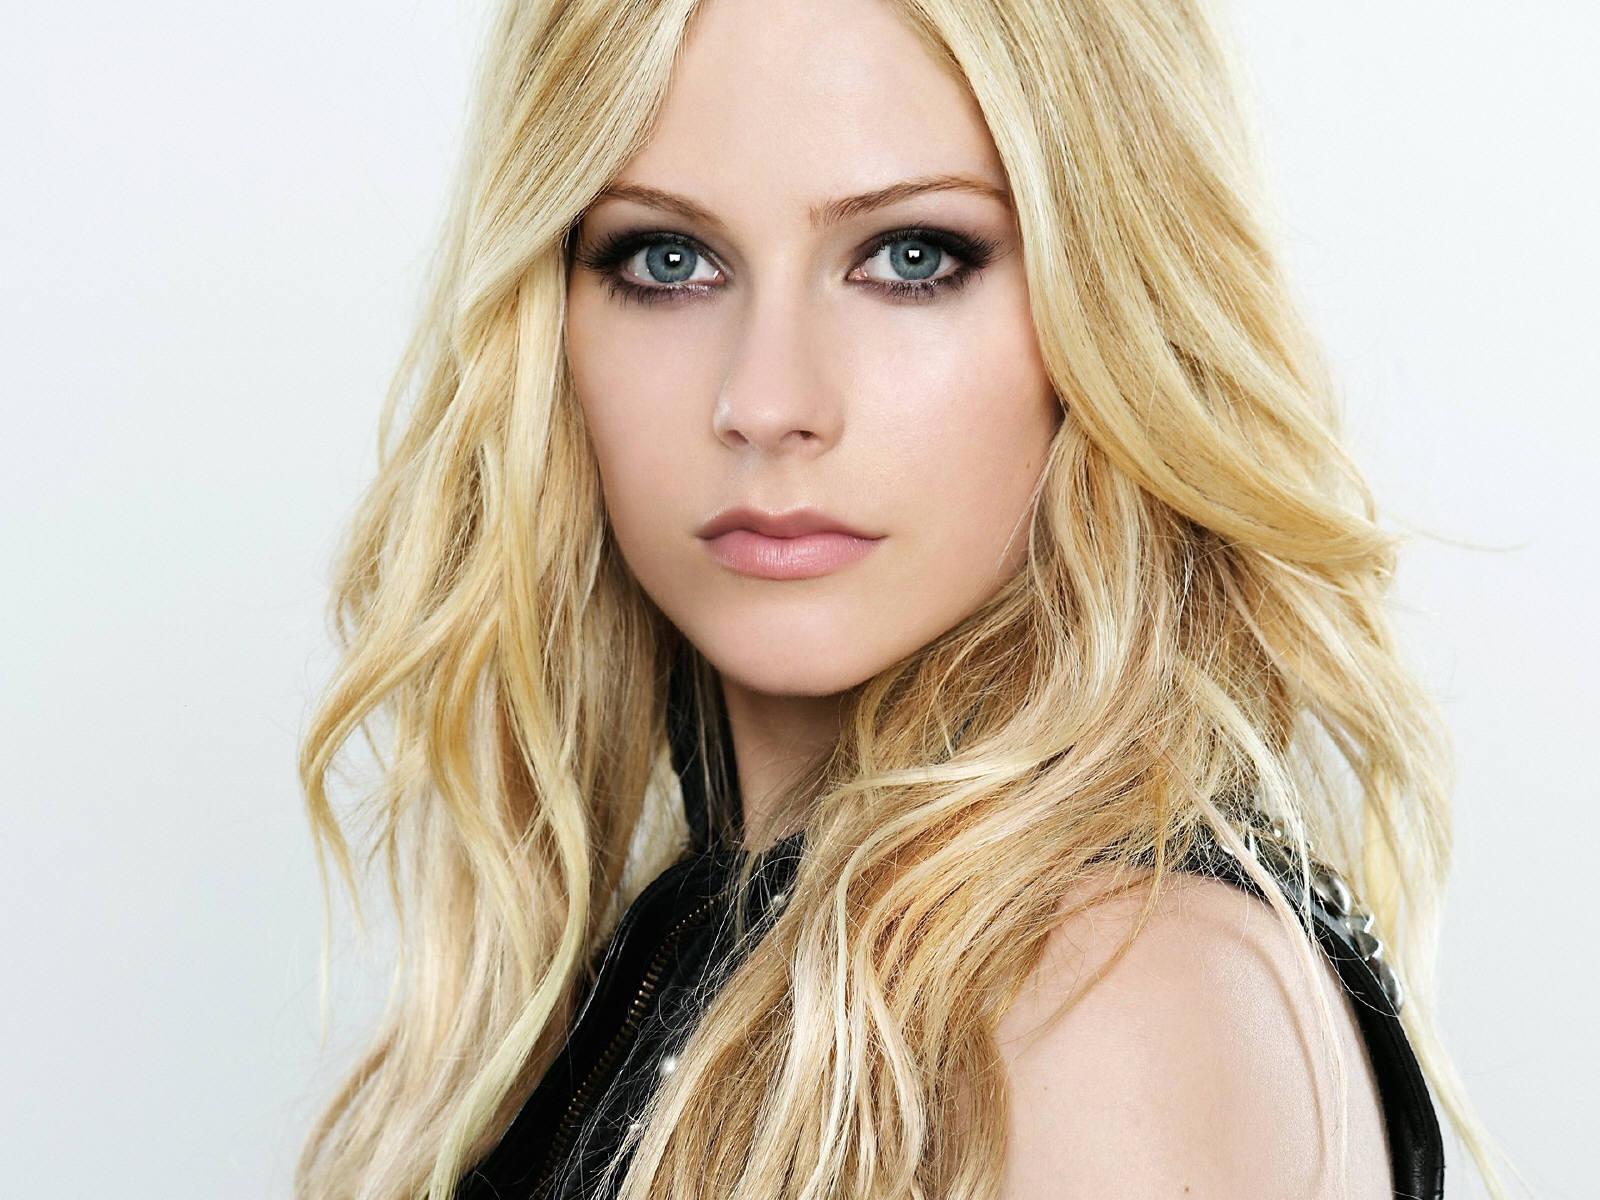 http://3.bp.blogspot.com/-bJYCWpU3ie4/Tu-QUtH1BzI/AAAAAAAAWUw/zugUk8wyUFo/s1600/Beautiful-Avril-Lavigne-Wallpapers-2.jpg